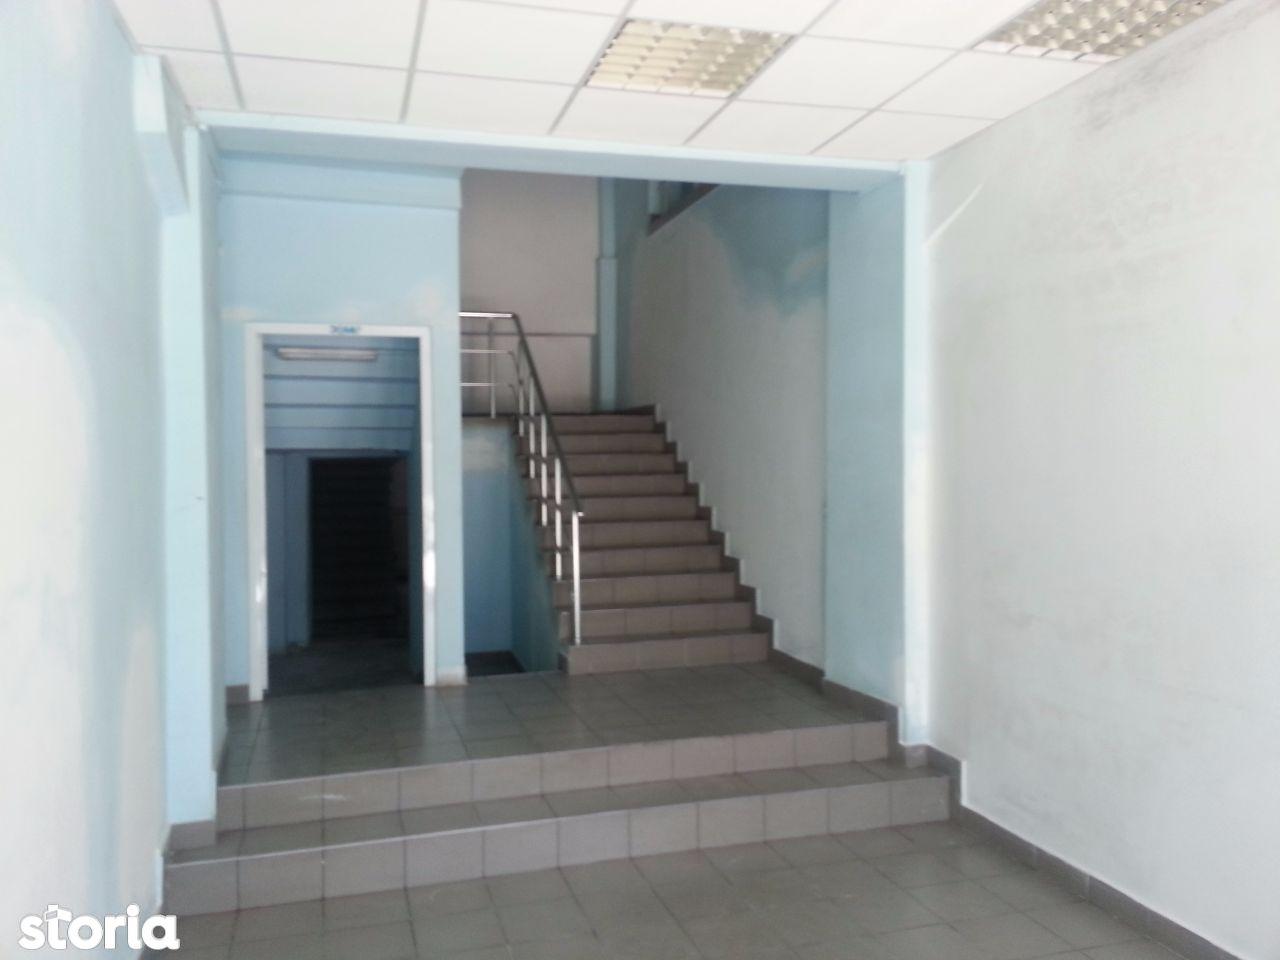 Spatiu Comercial de inchiriat, Dâmbovița (judet), Târgovişte - Foto 2